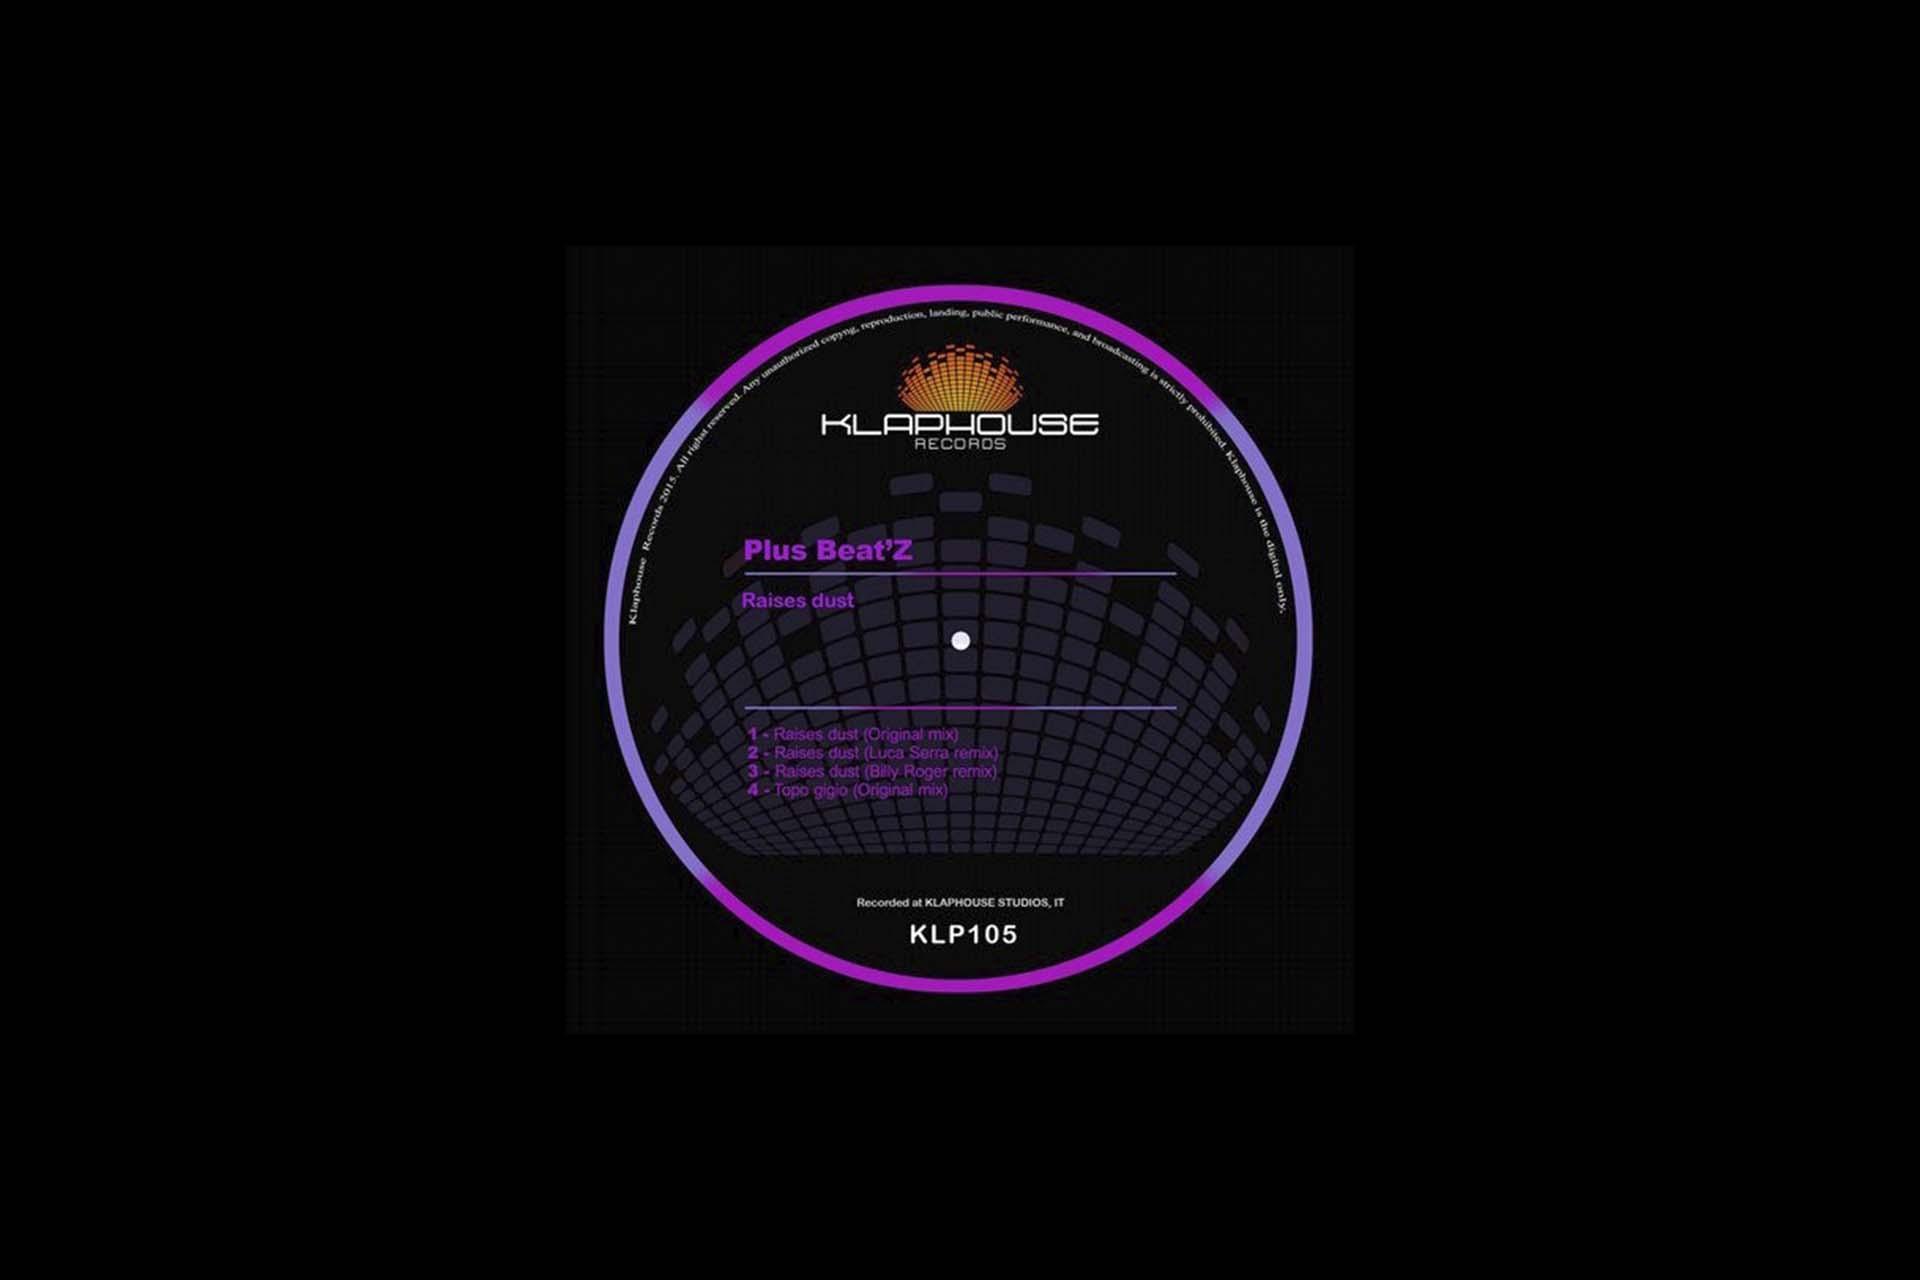 EP Raises - Plus Beat'Z